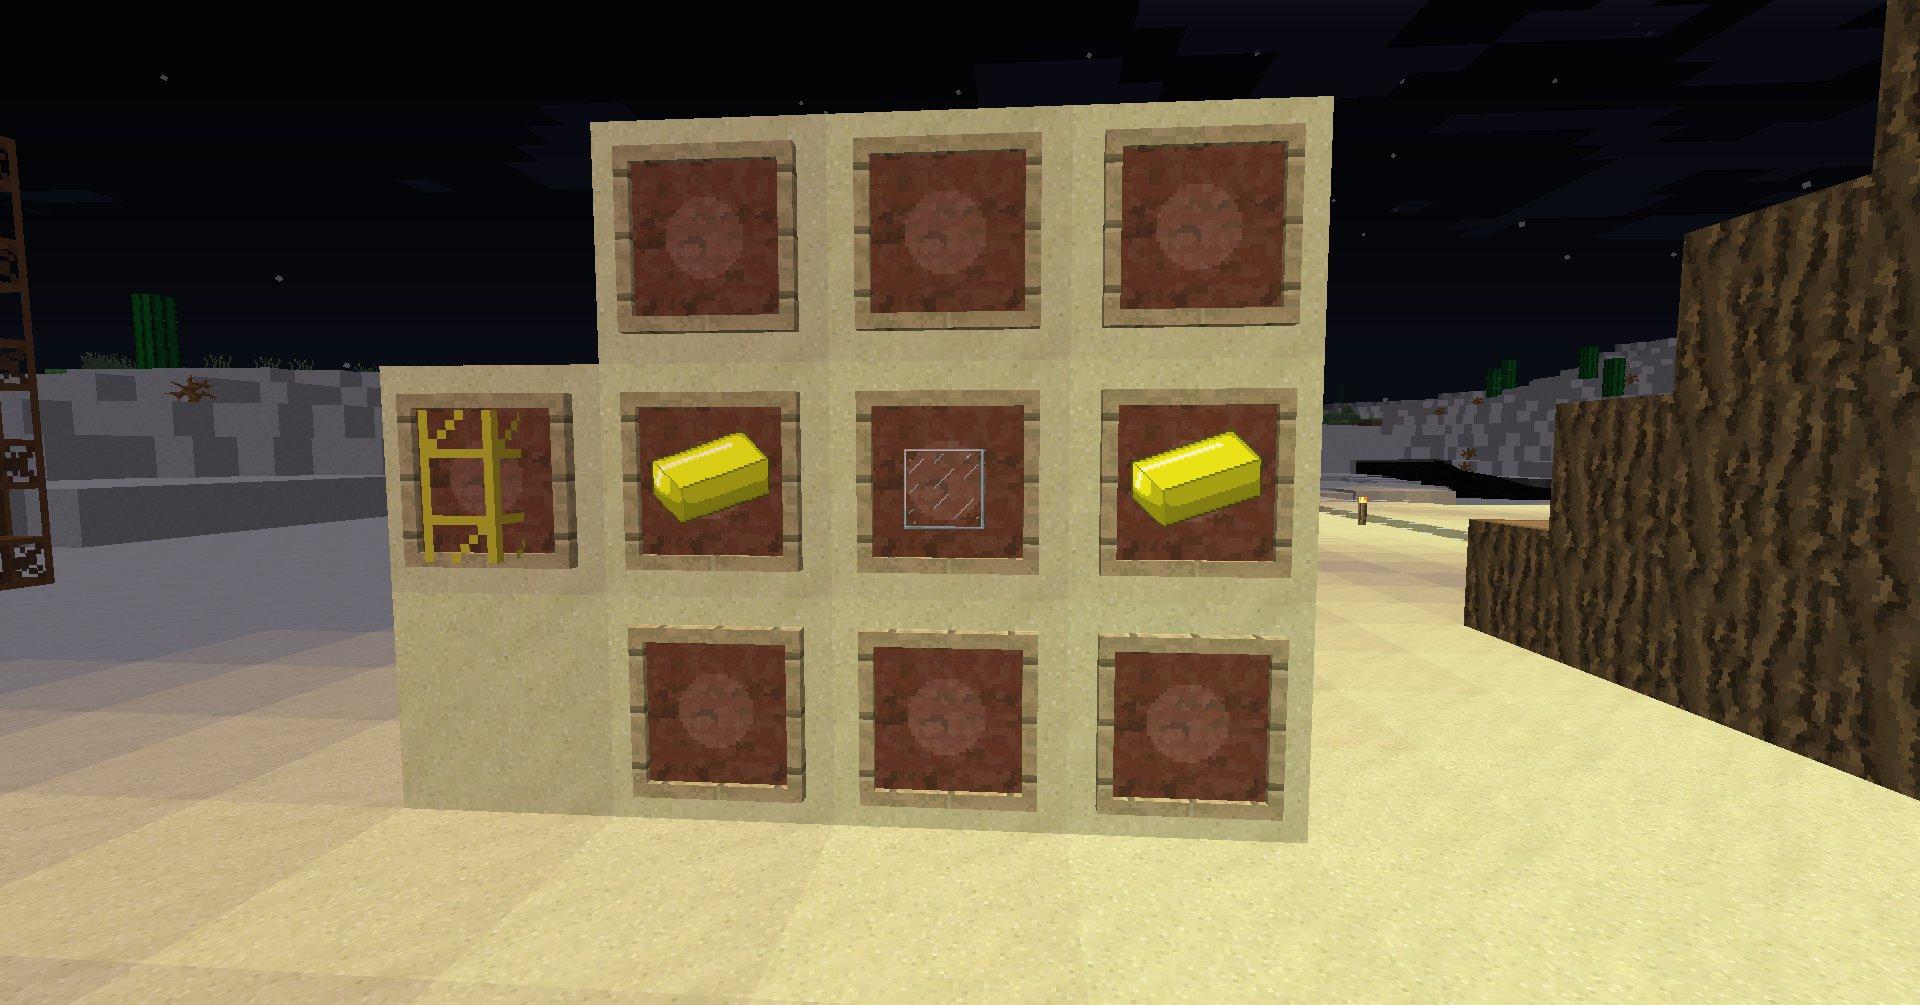 poradnik buildcraft 3 3